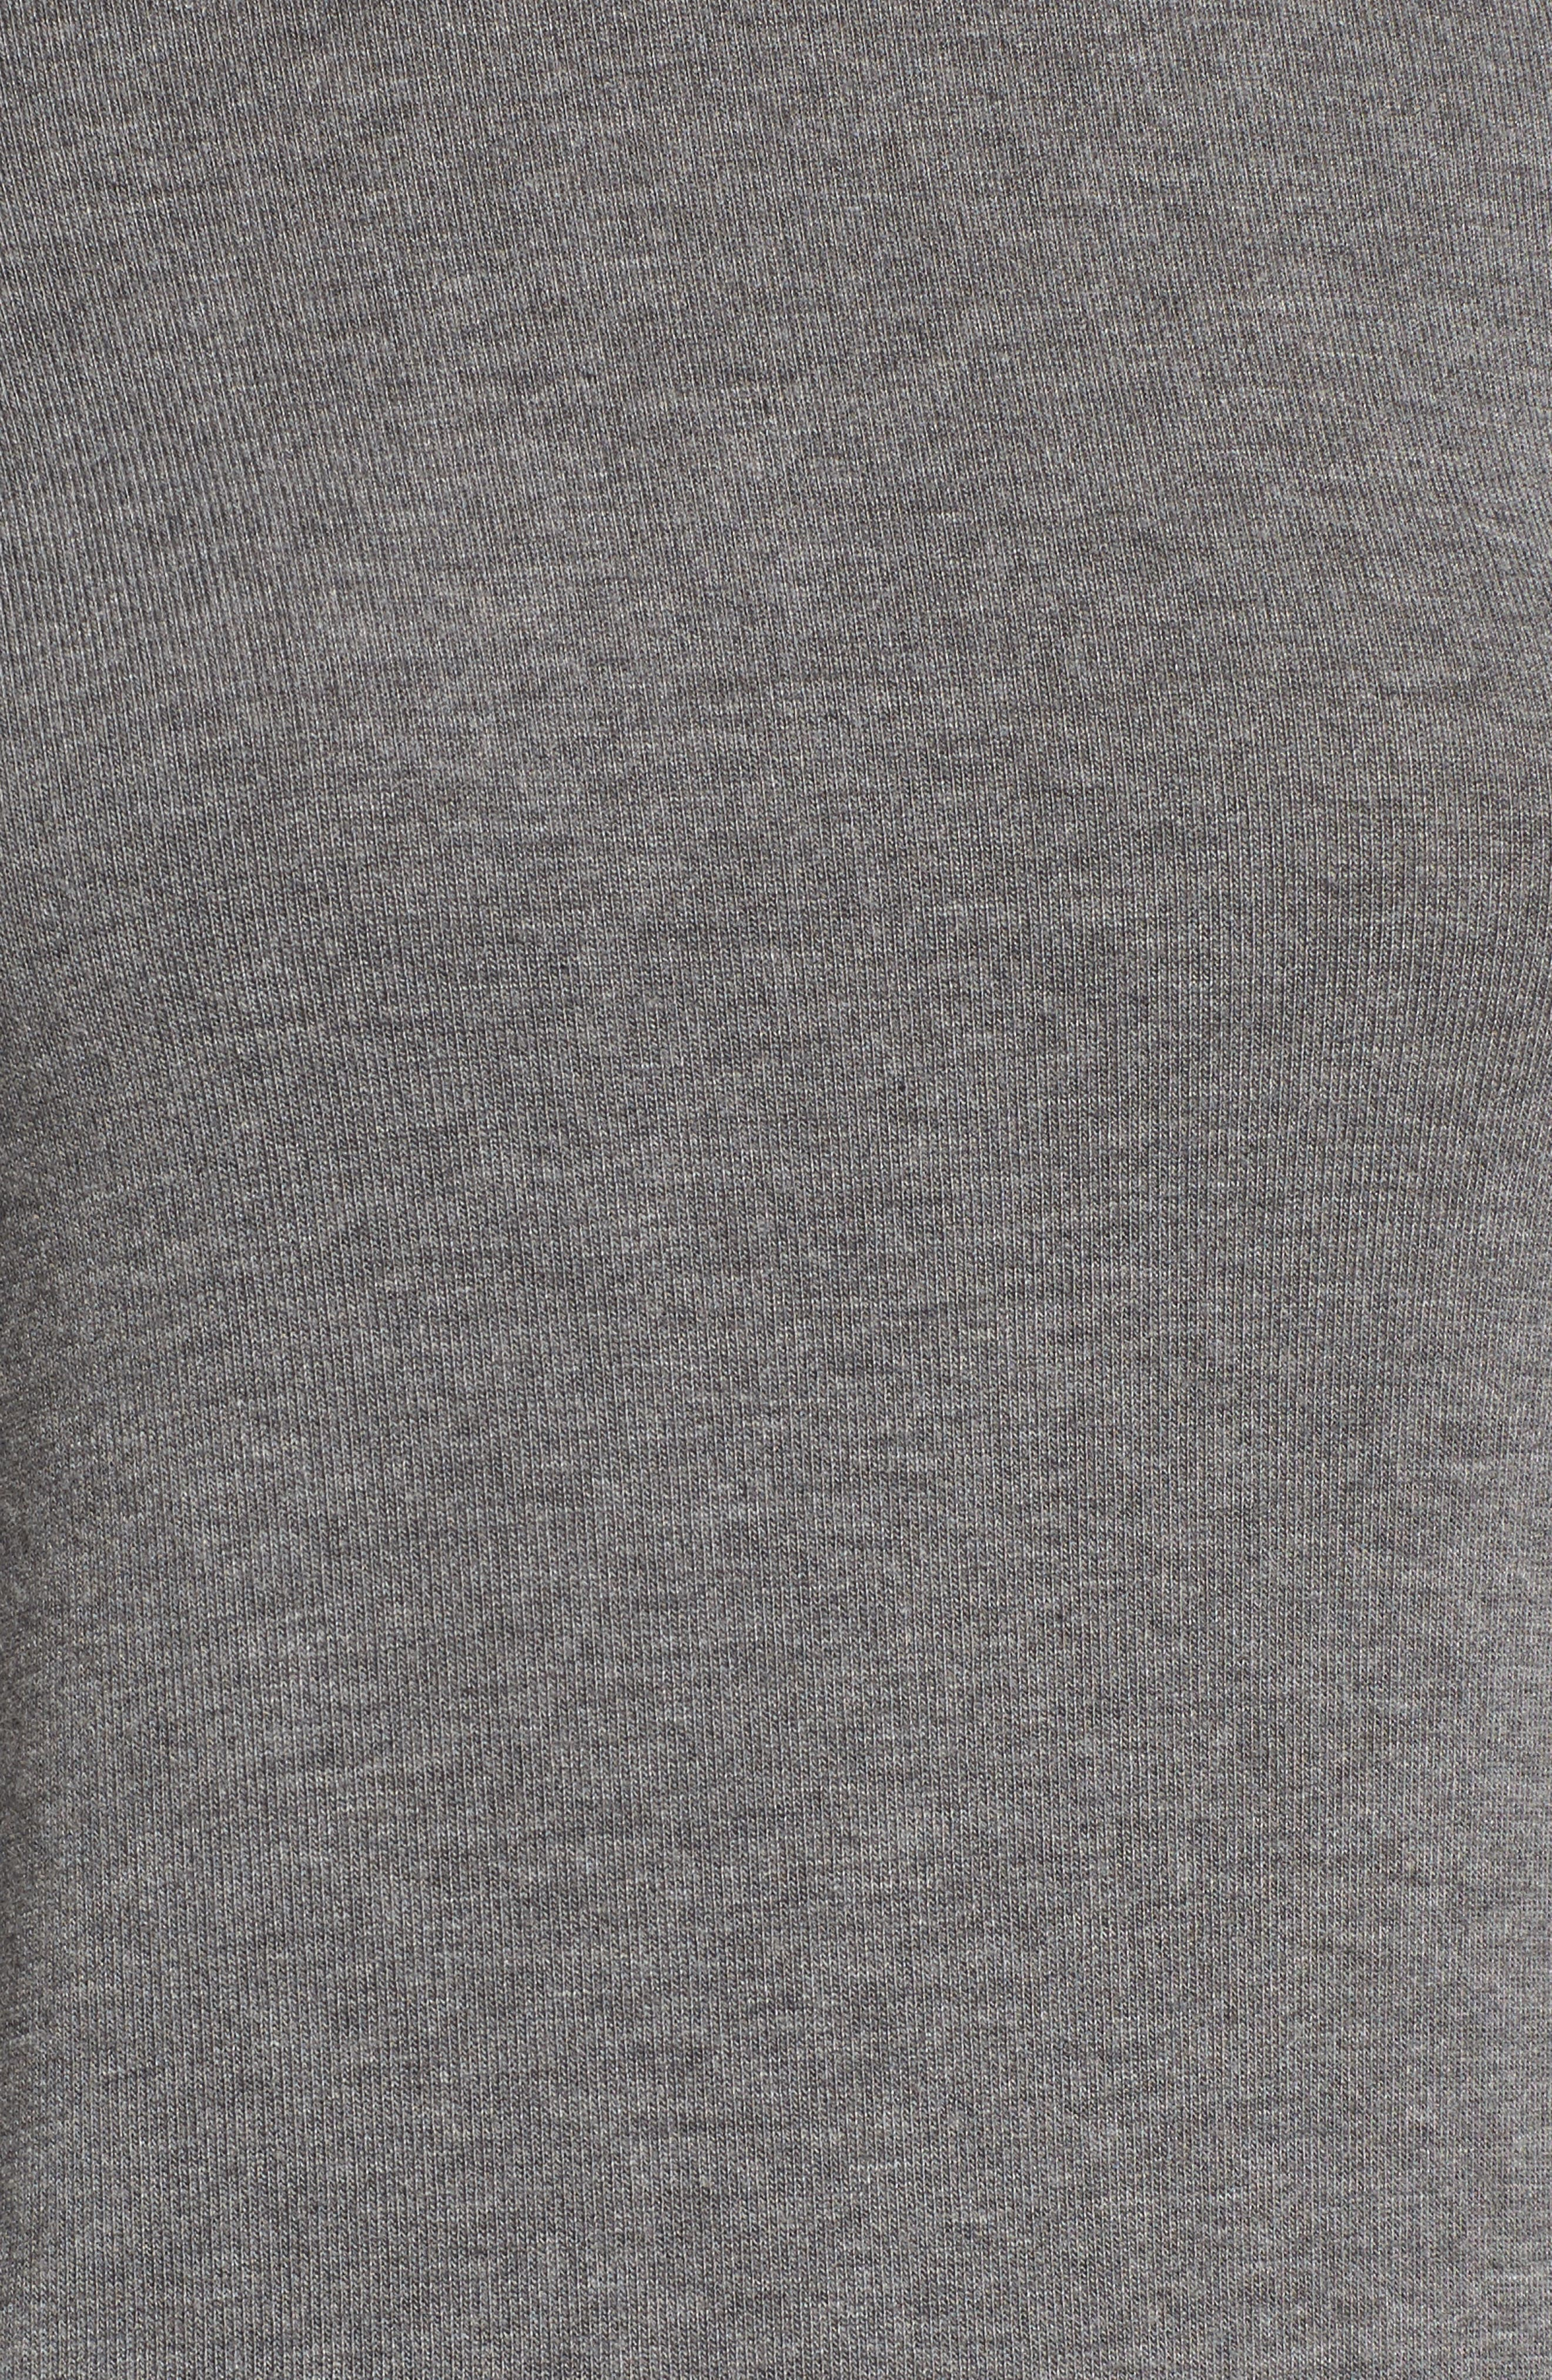 Alternate Image 5  - Bailey 44 Elizabeth III Sweater